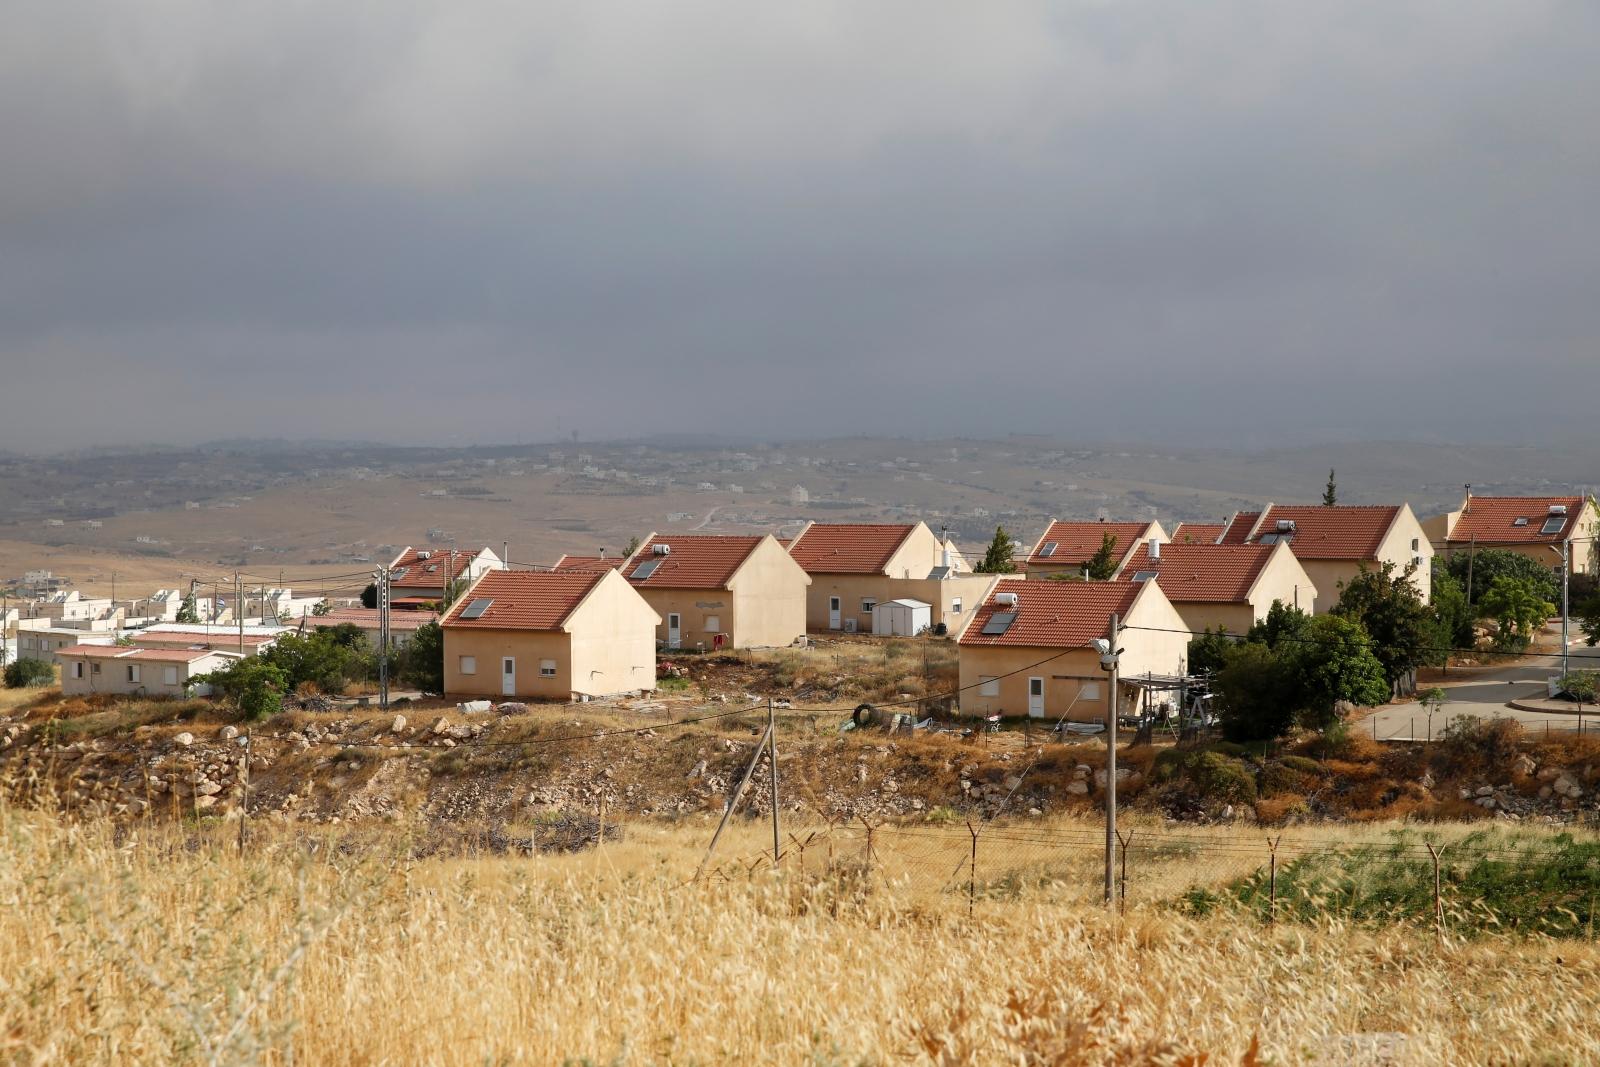 Israel settlement plans